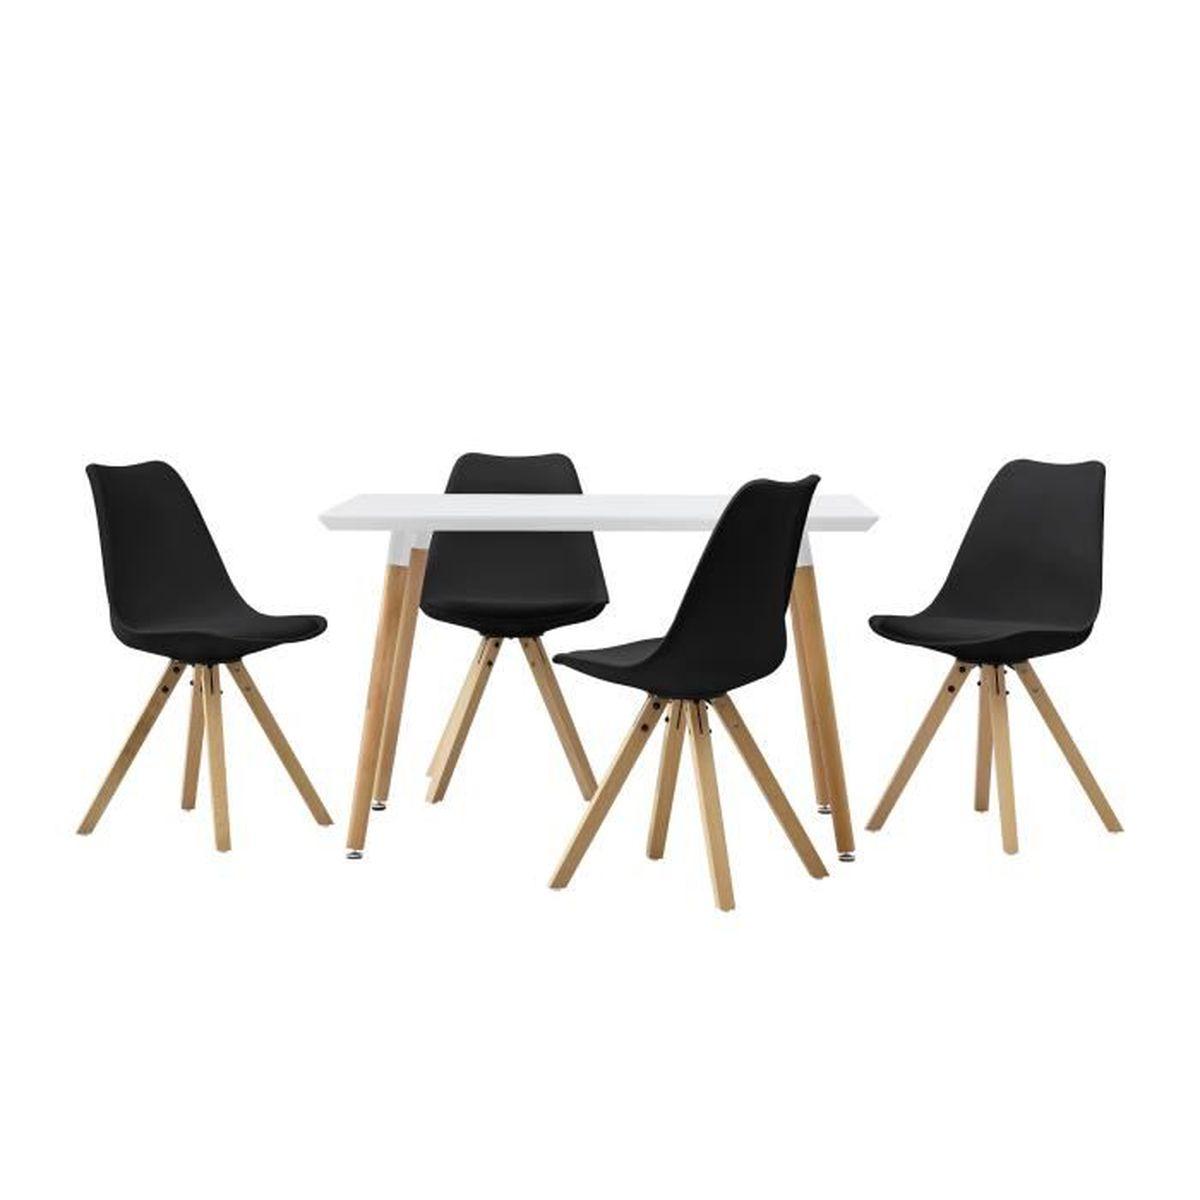 Table de salle manger avec 4 chaises noir for Table salle a manger avec chaises